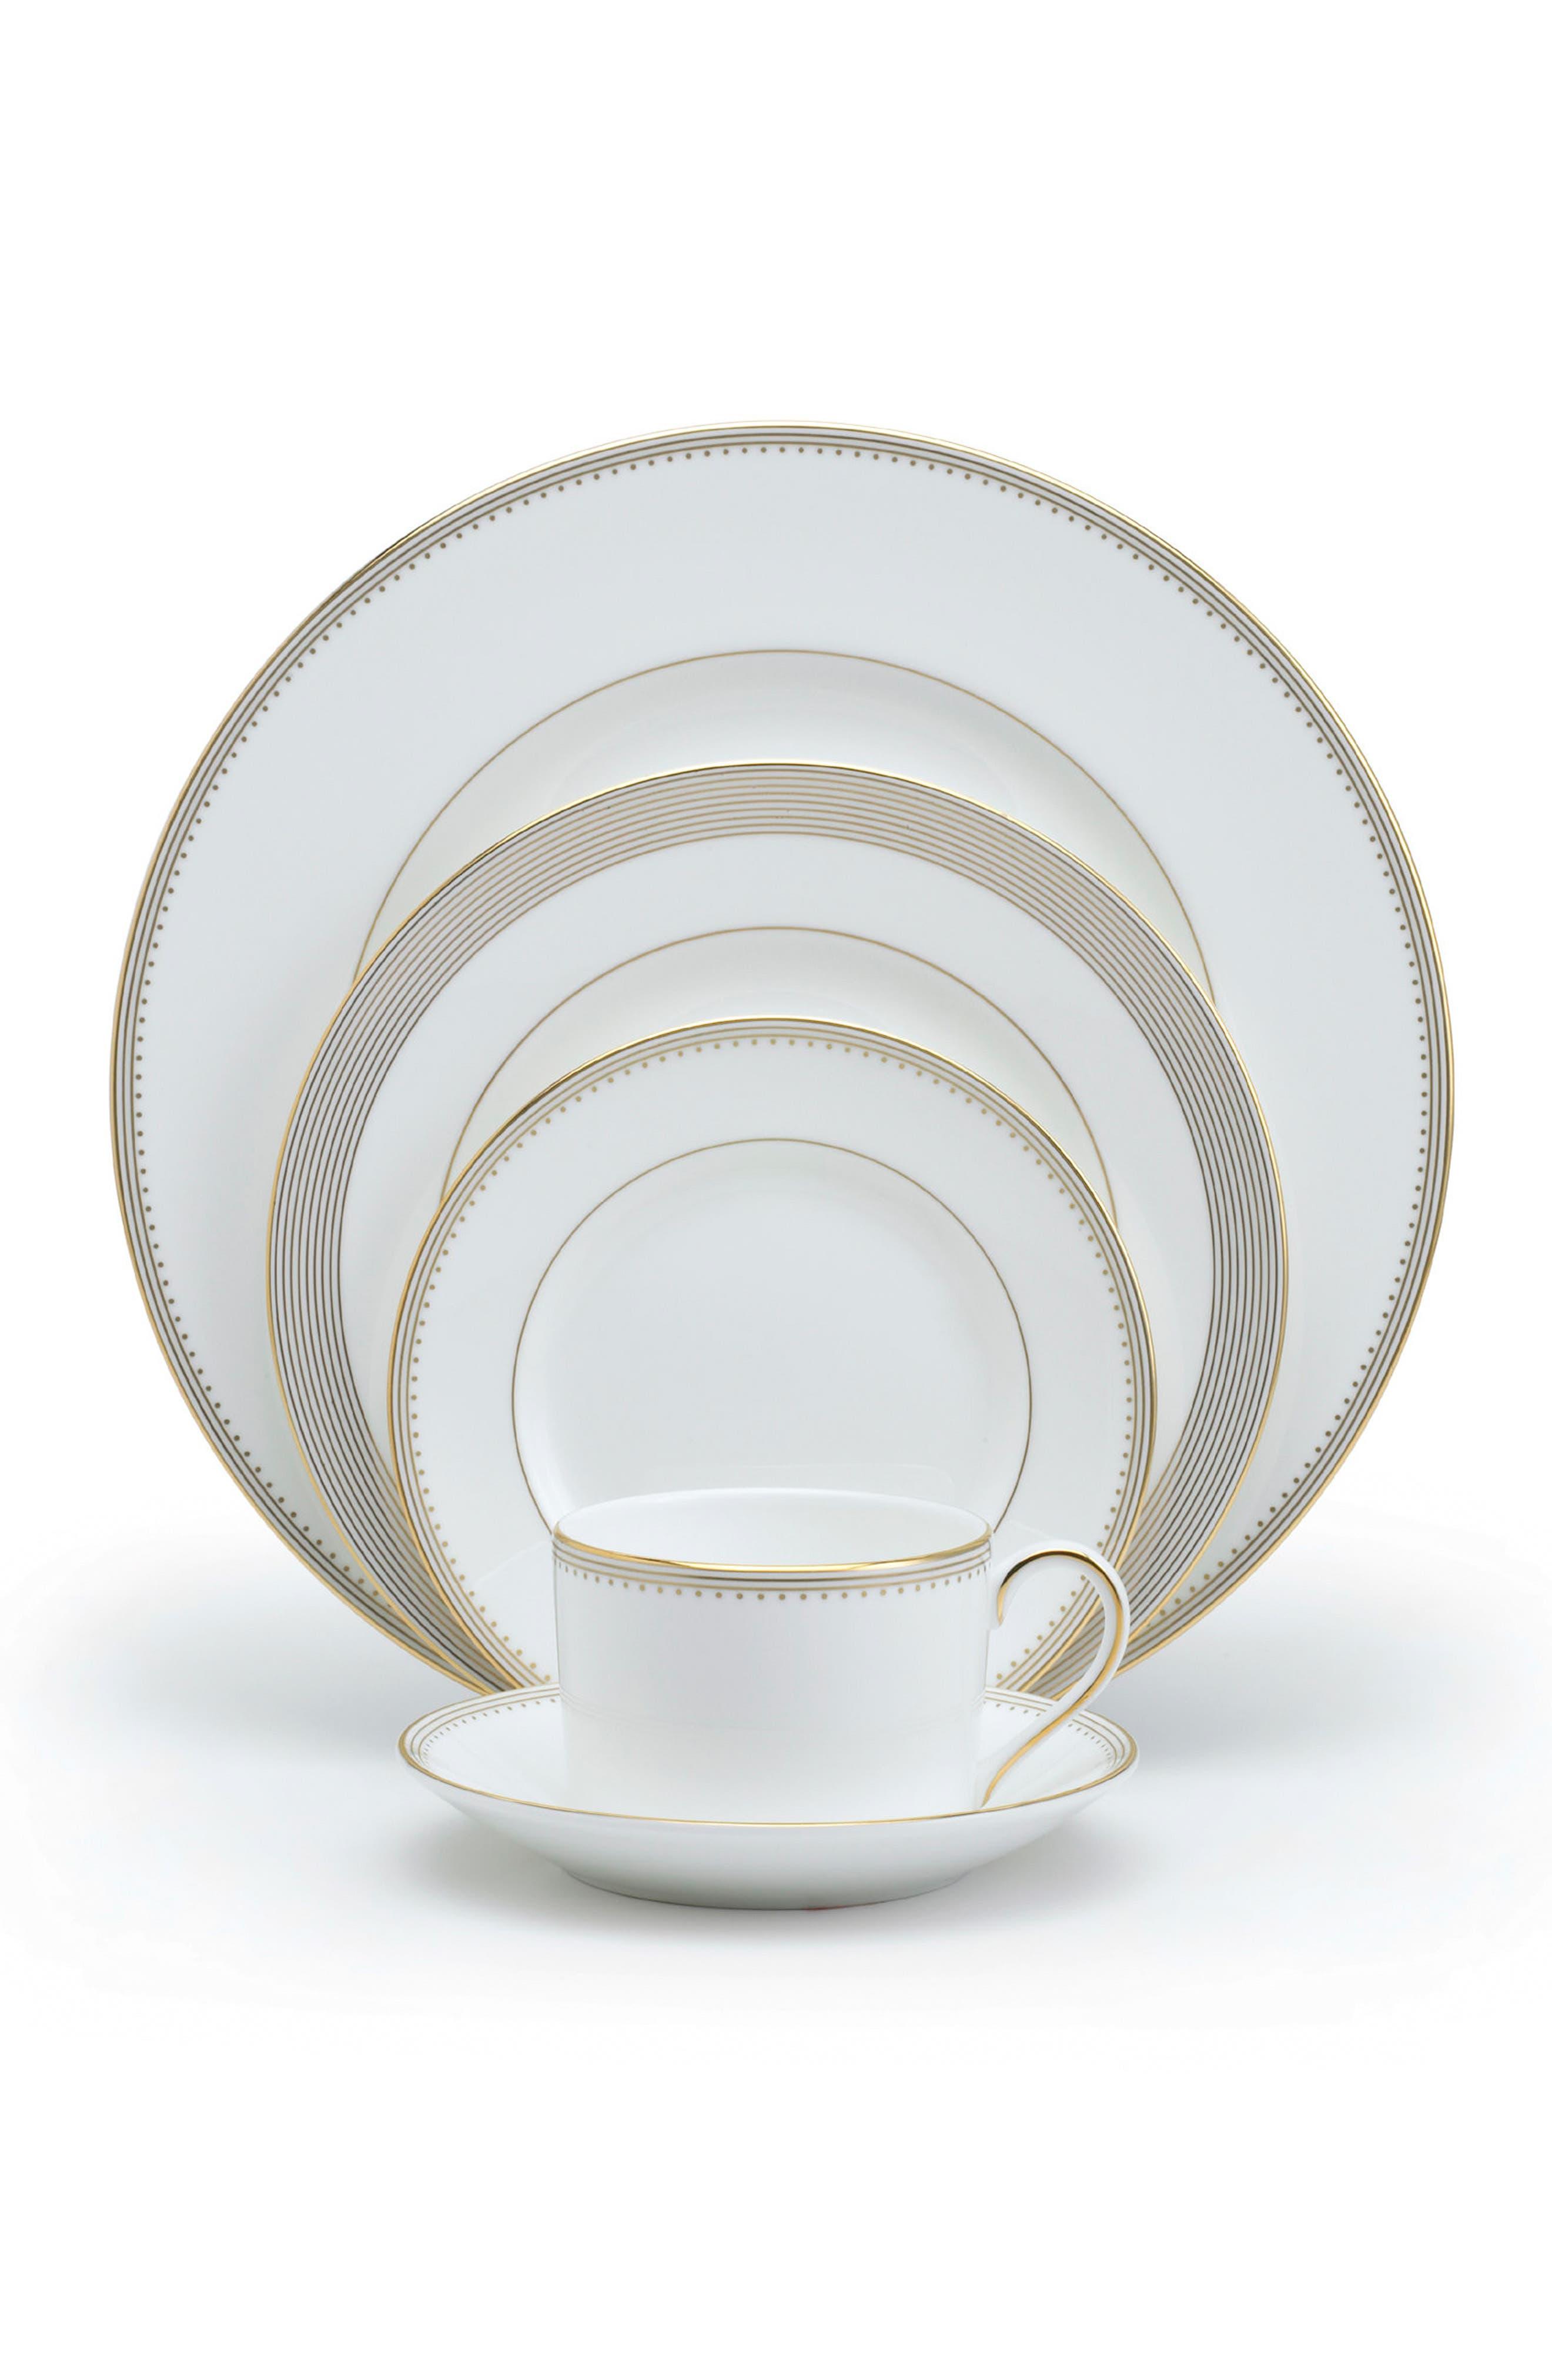 Alternate Image 1 Selected - Vera Wang 5-Piece Bone China Dinnerware Place Setting